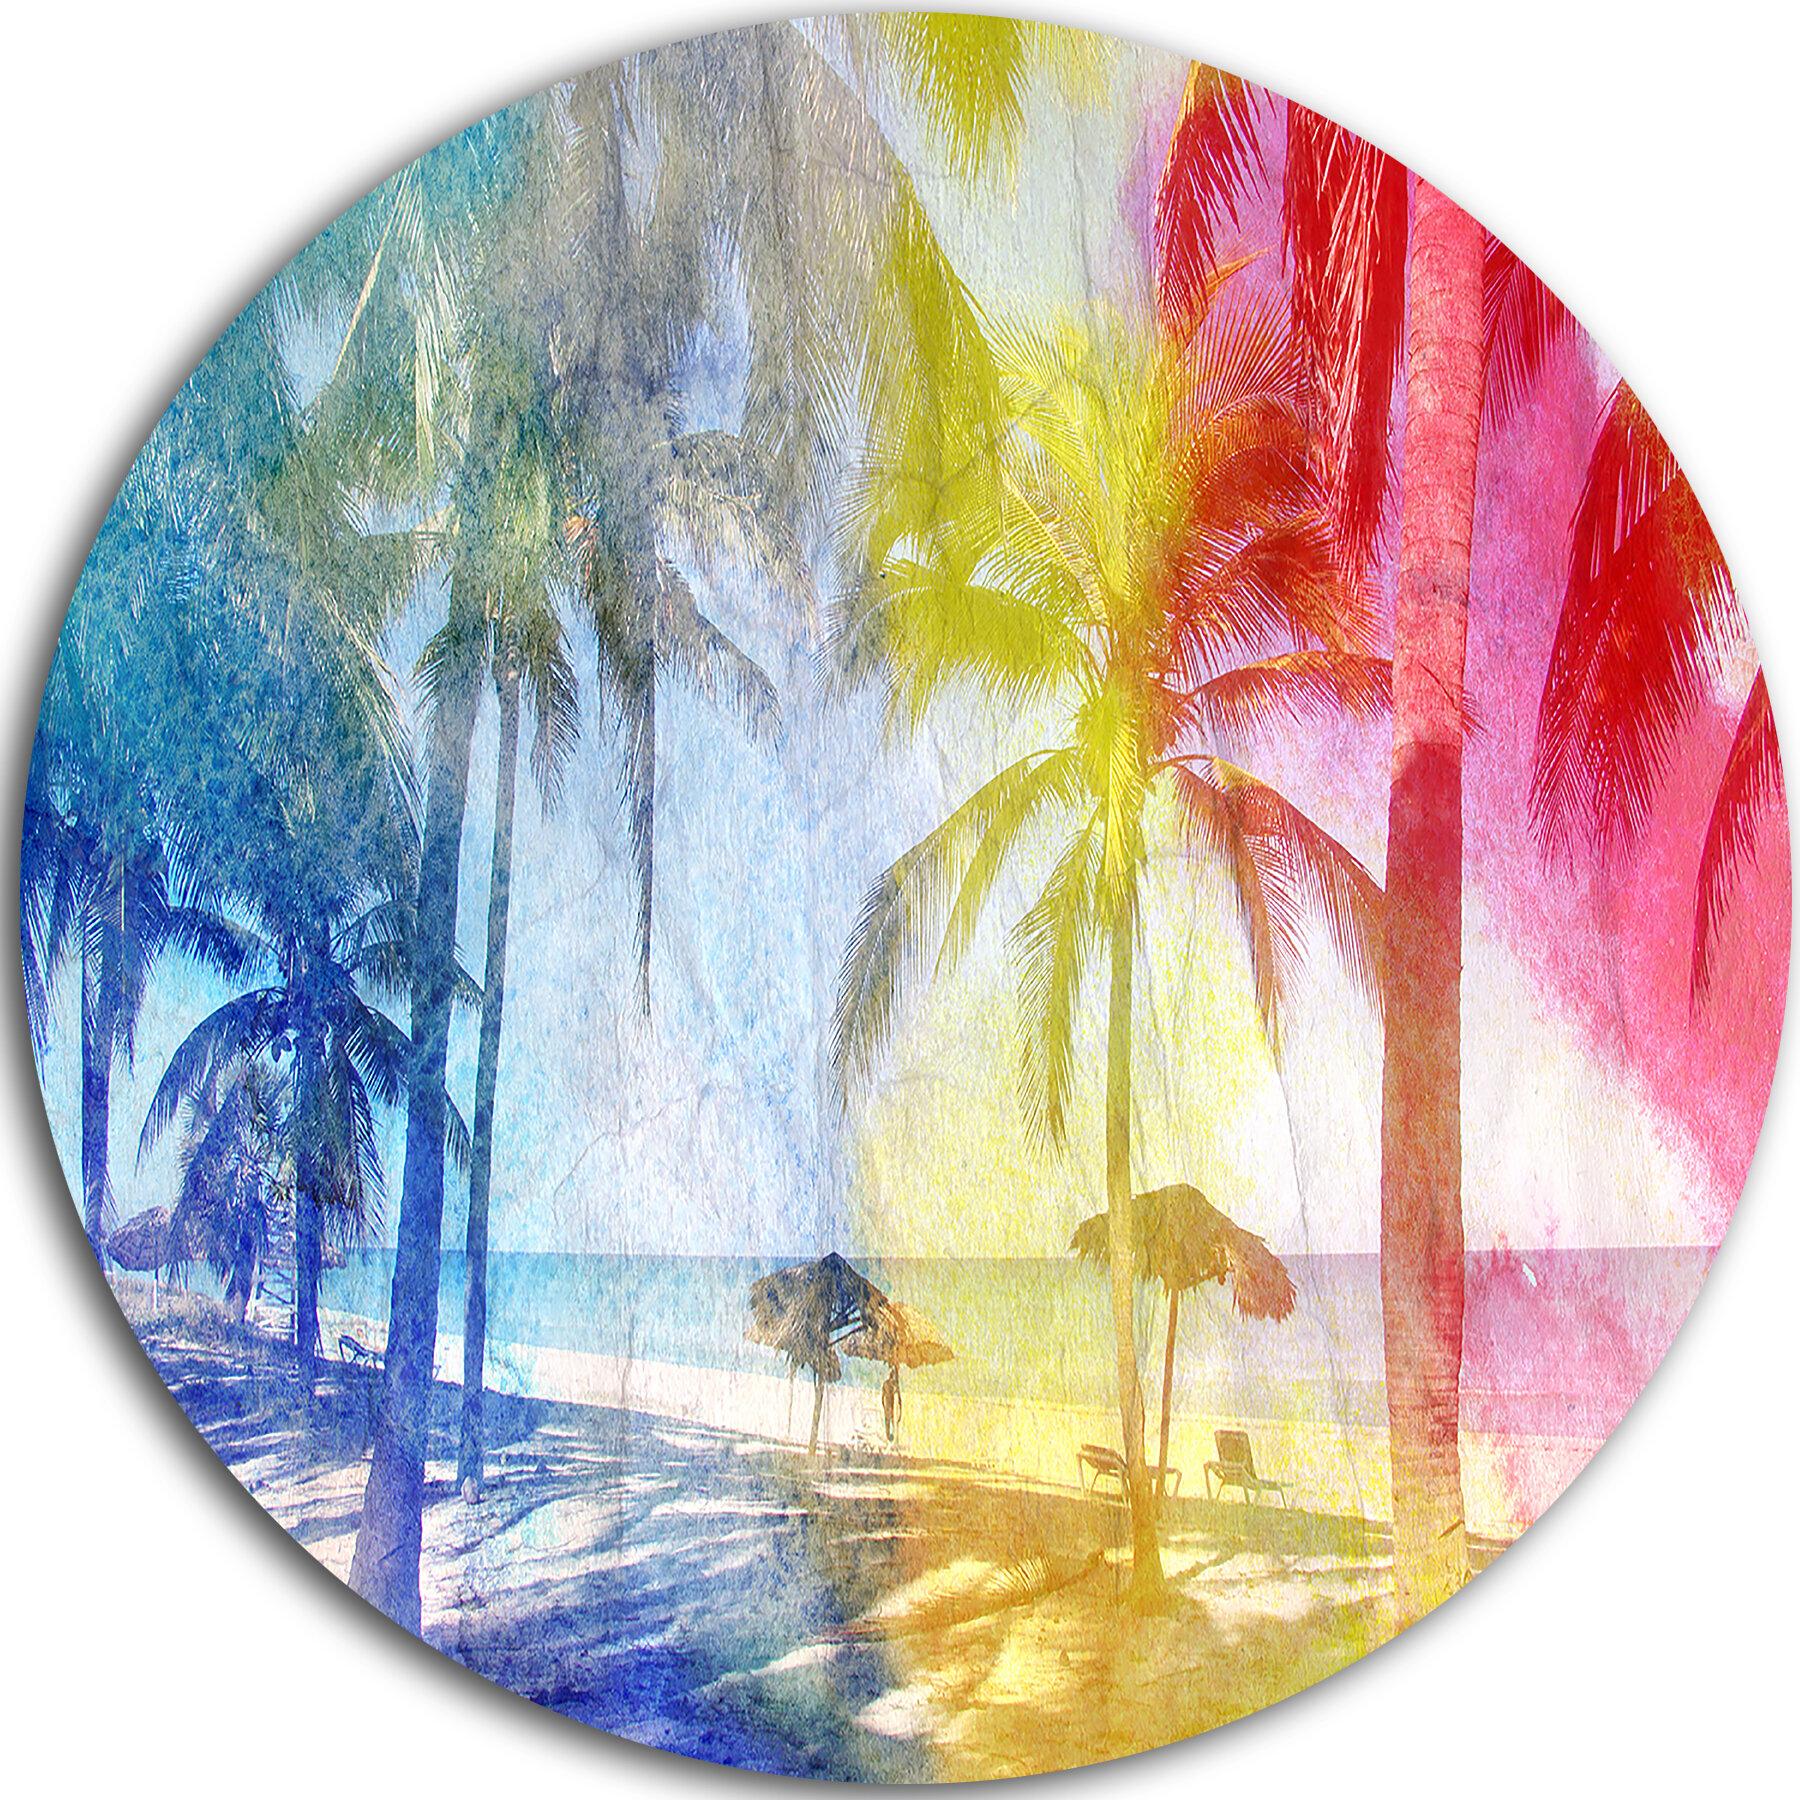 DesignArt \'Blue Retro Palm Trees\' Graphic Art Print on Metal   Wayfair